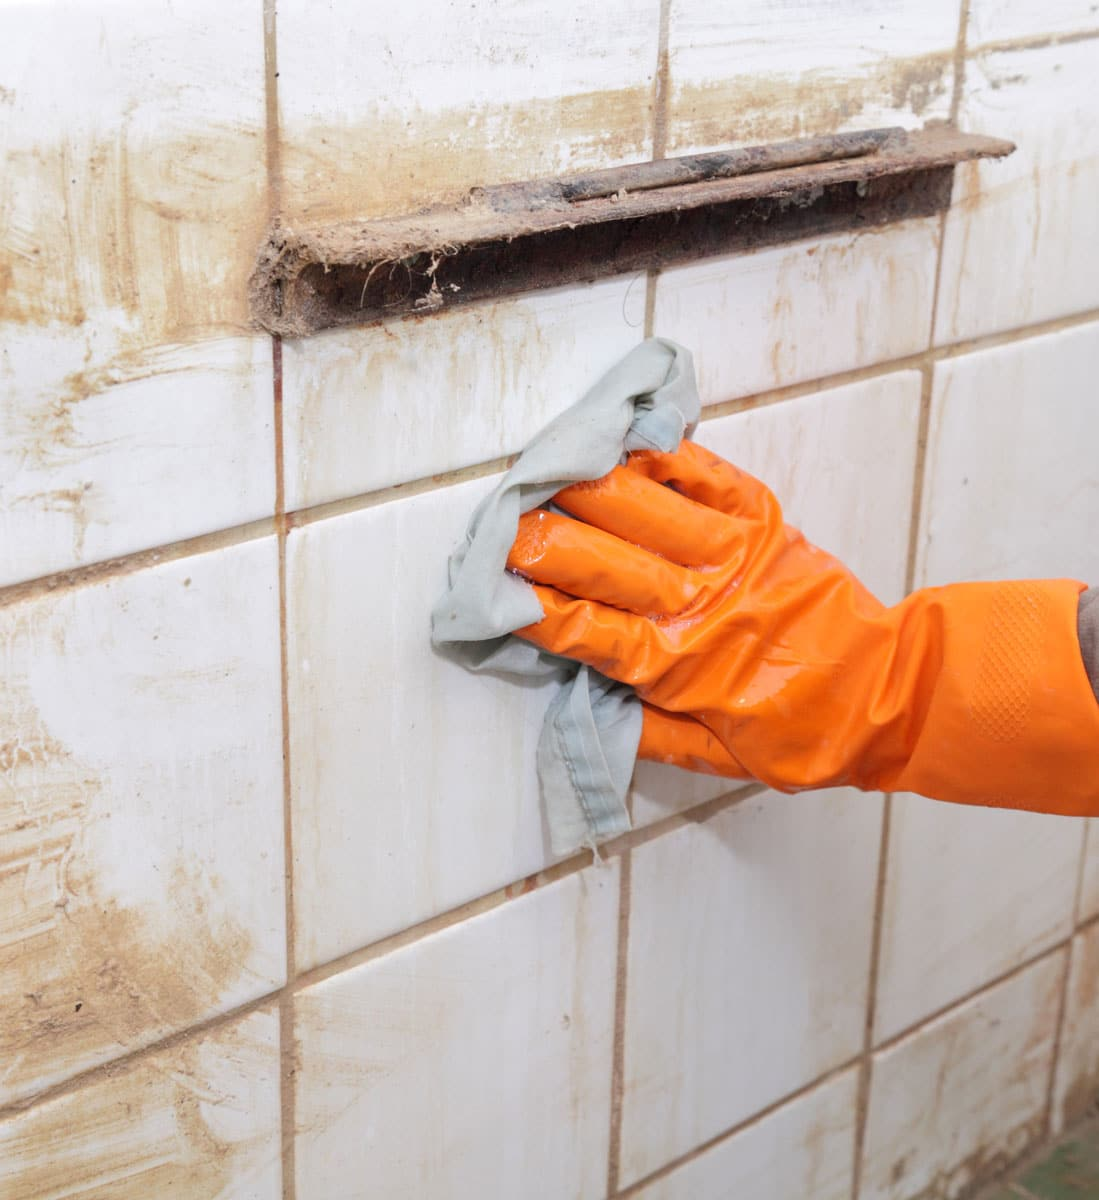 Tile Cleaning in Reston, Rockville, MD, Ashburn, Bethesda, MD